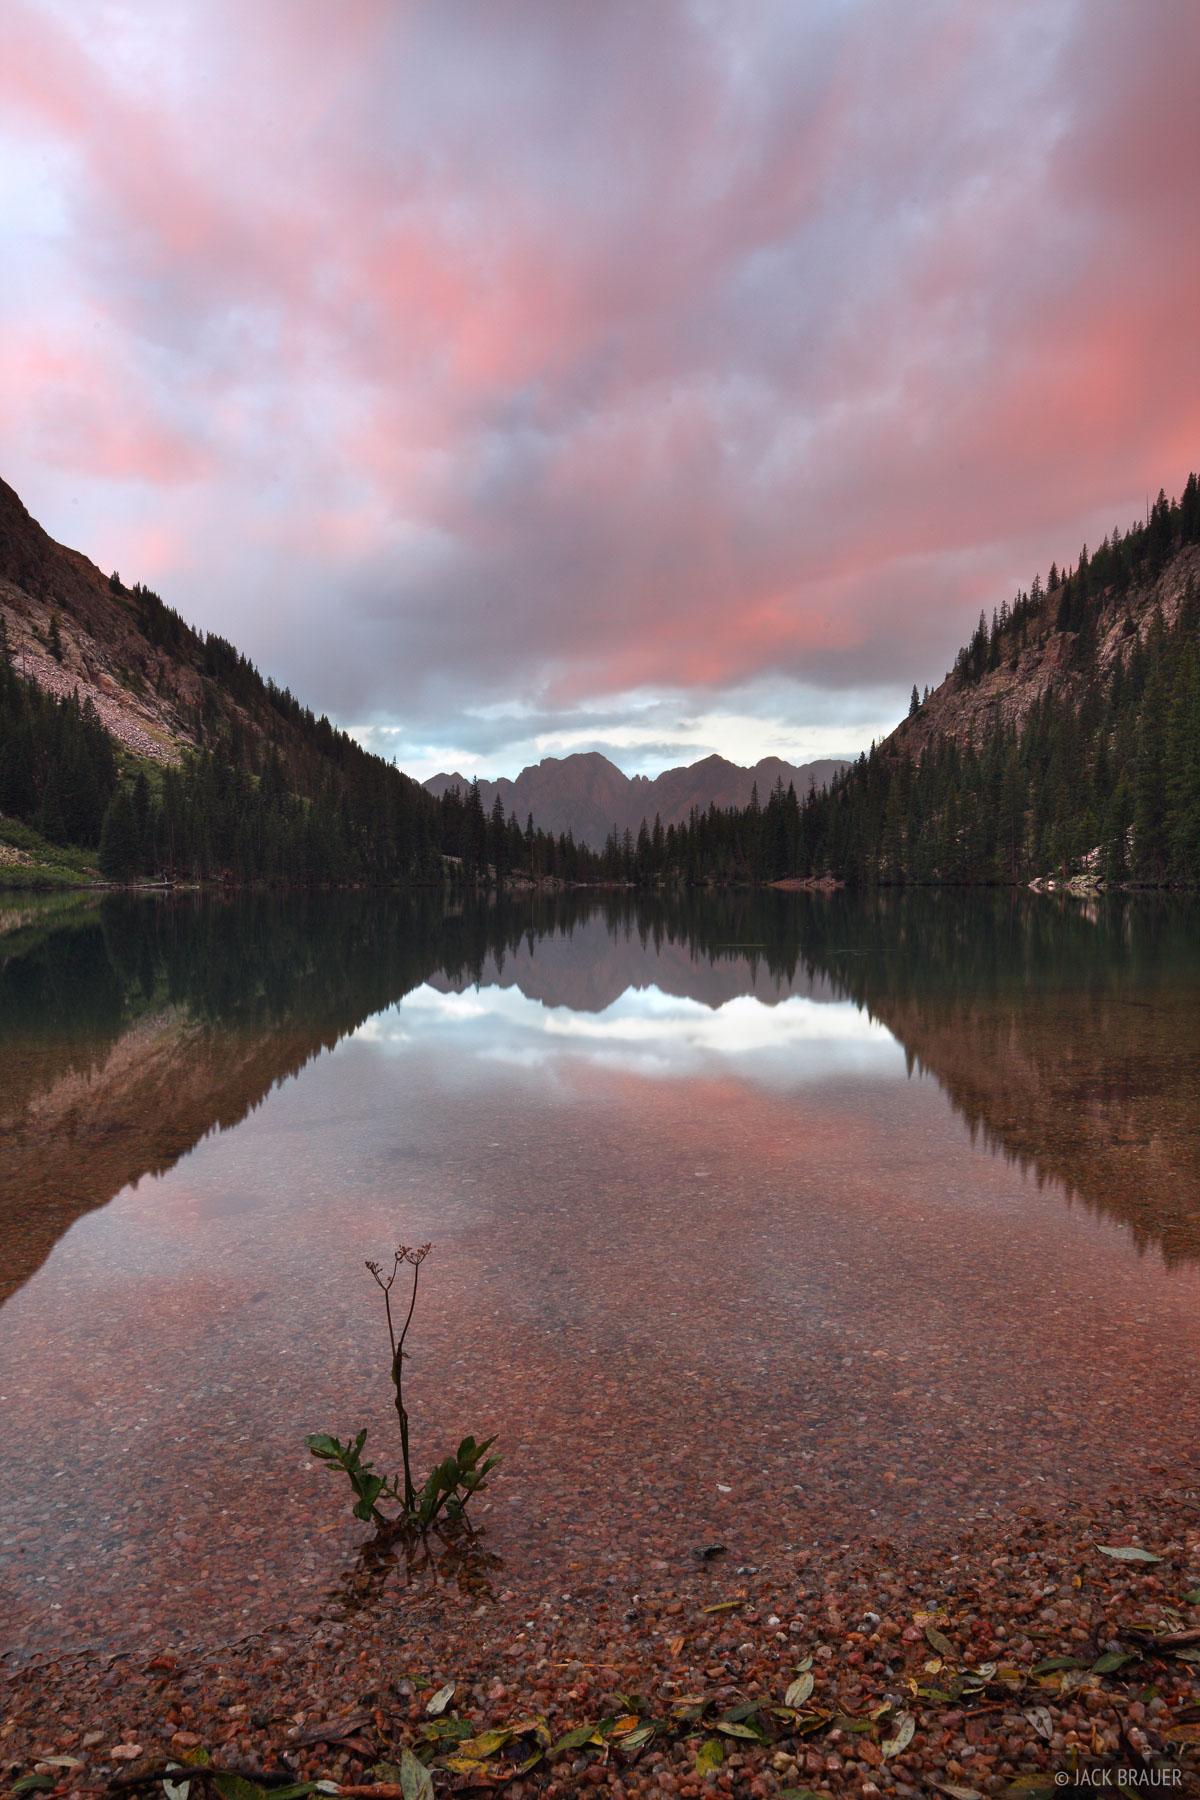 sunrise, West Needle Mountains, San Juan Mountains, Colorado, photo